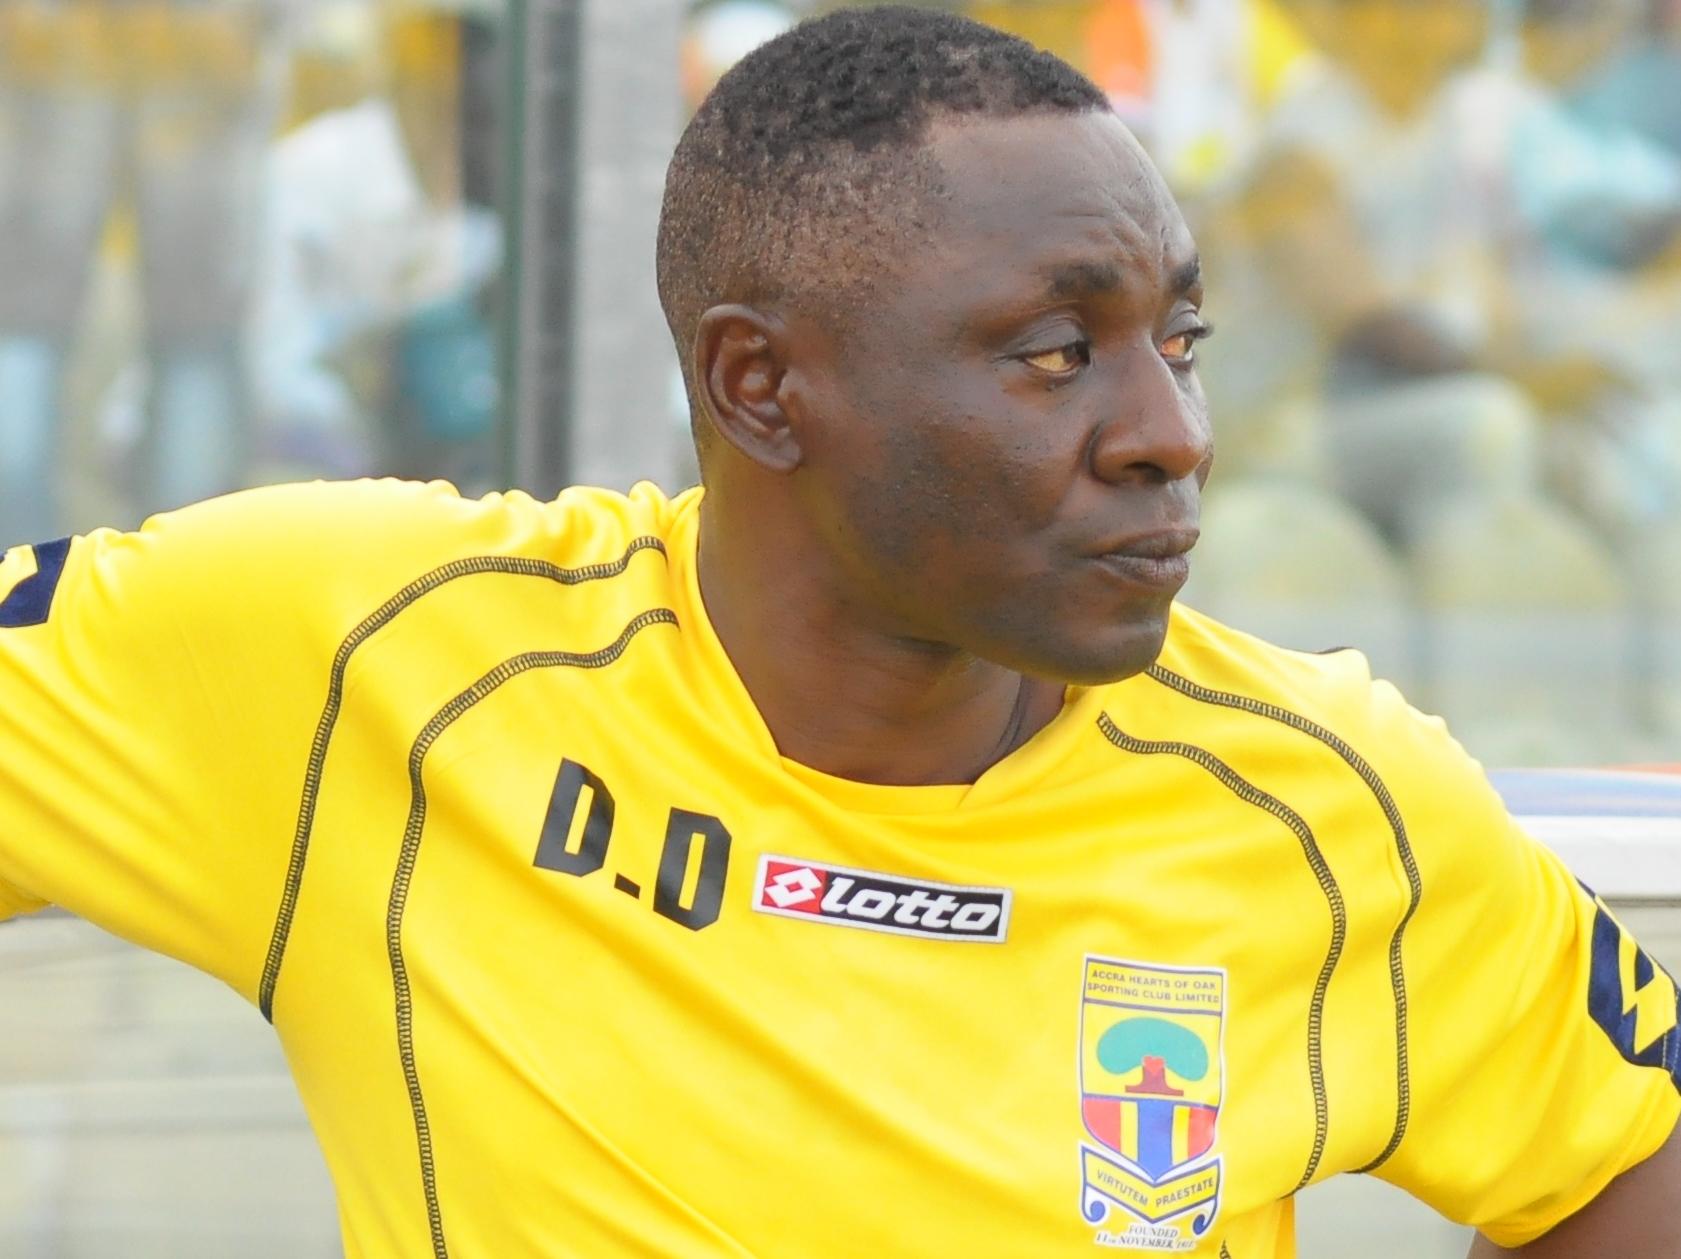 Ex-Kotoko coach David Duncan among FIVE candidates shortlisted for Karela FC job